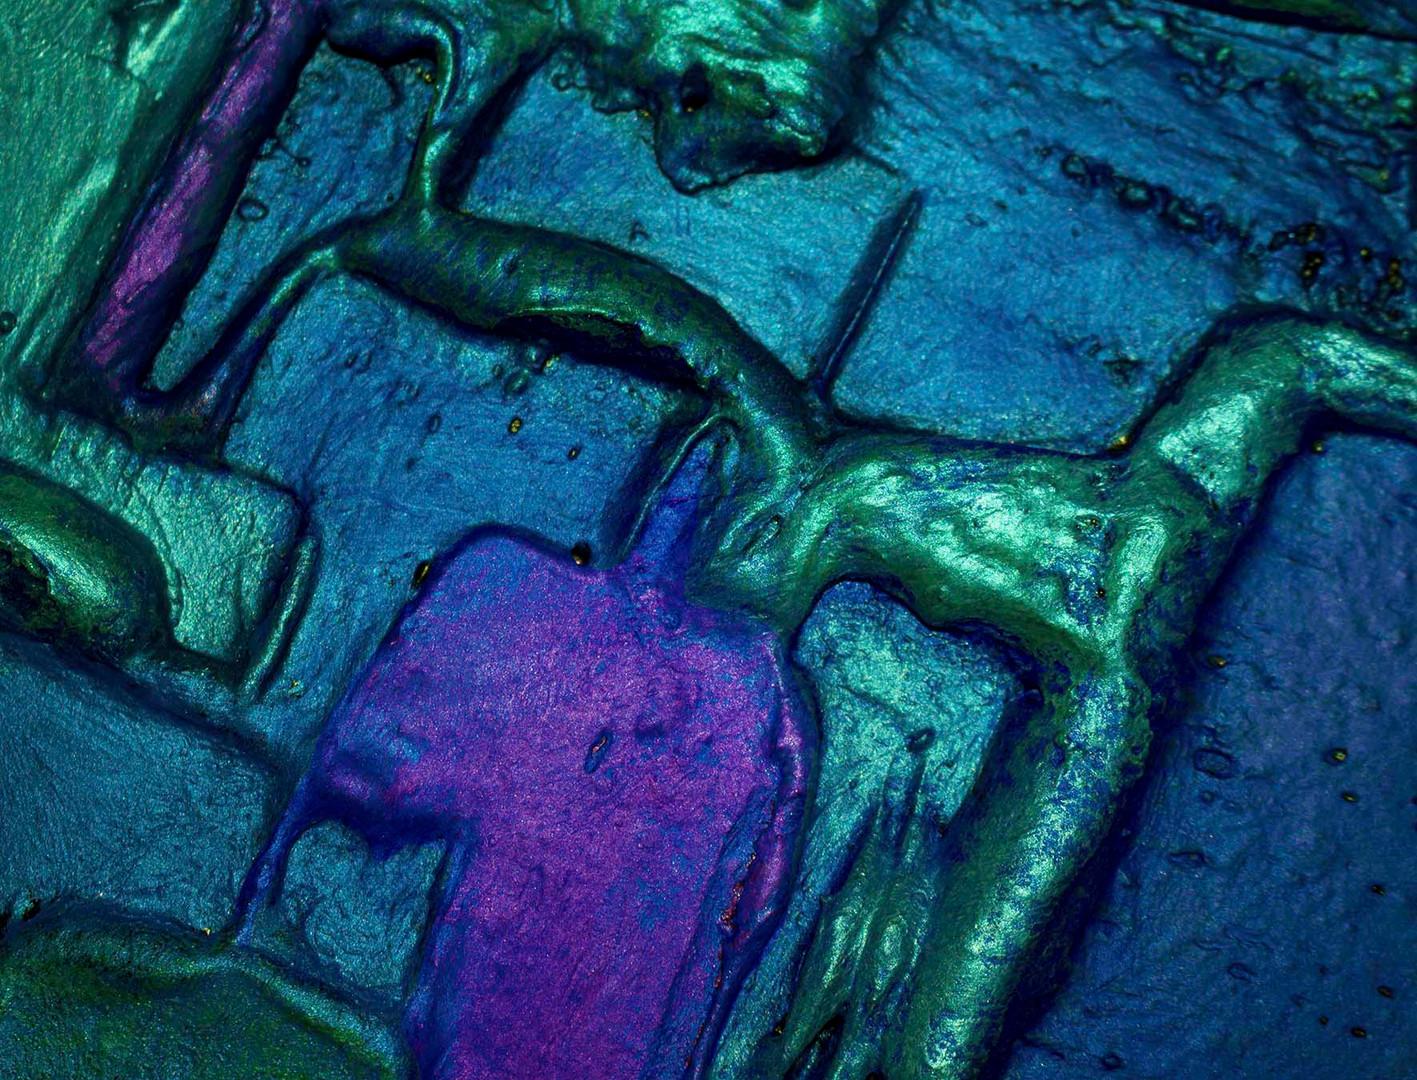 0031CRYSTAL CELL III CLOSE 1 31X31CM.jpg